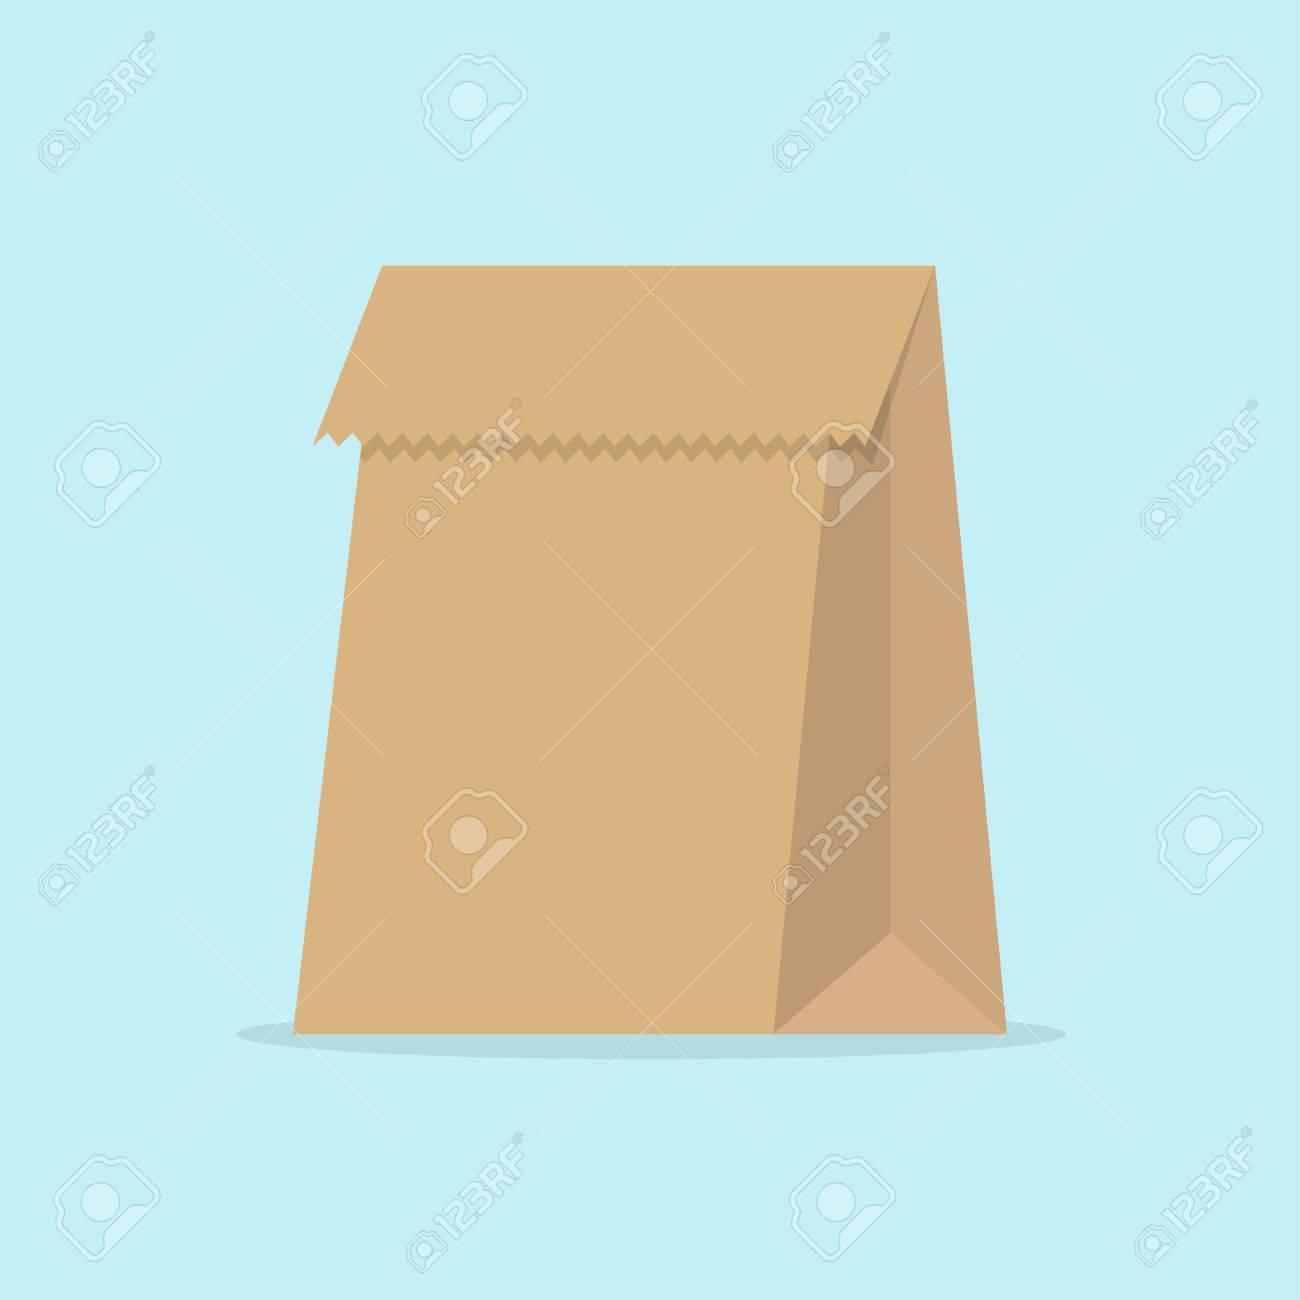 Paper bag vector - Paper Bag In Flat Style Paper Bag Food Image Paper Bag Vector Illustration